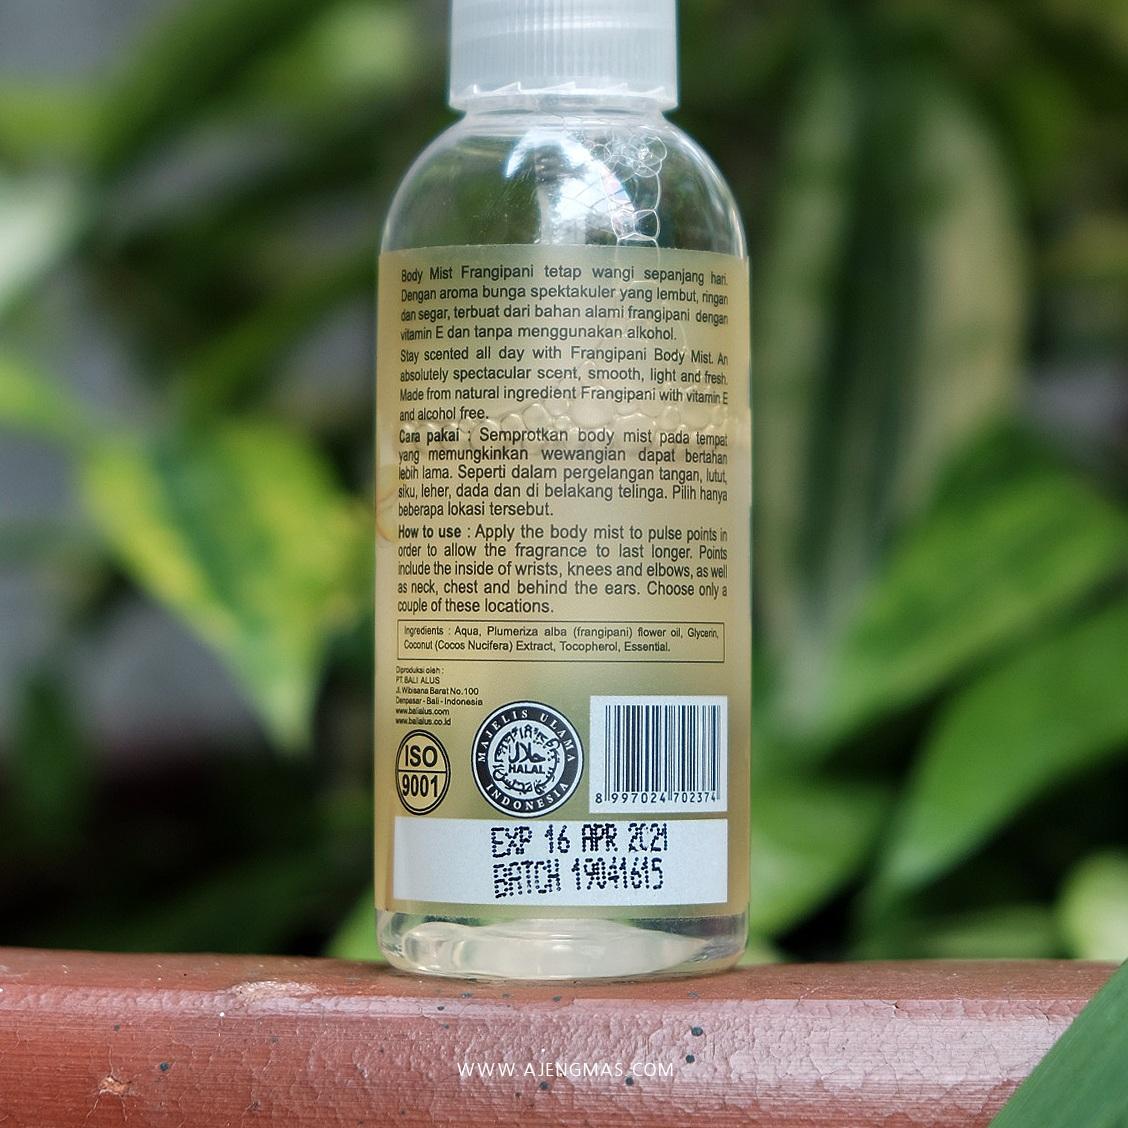 body-mist-bali-alus-frangipani-olive-skincare-aman-untuk-ibu-hamil-ajengmas